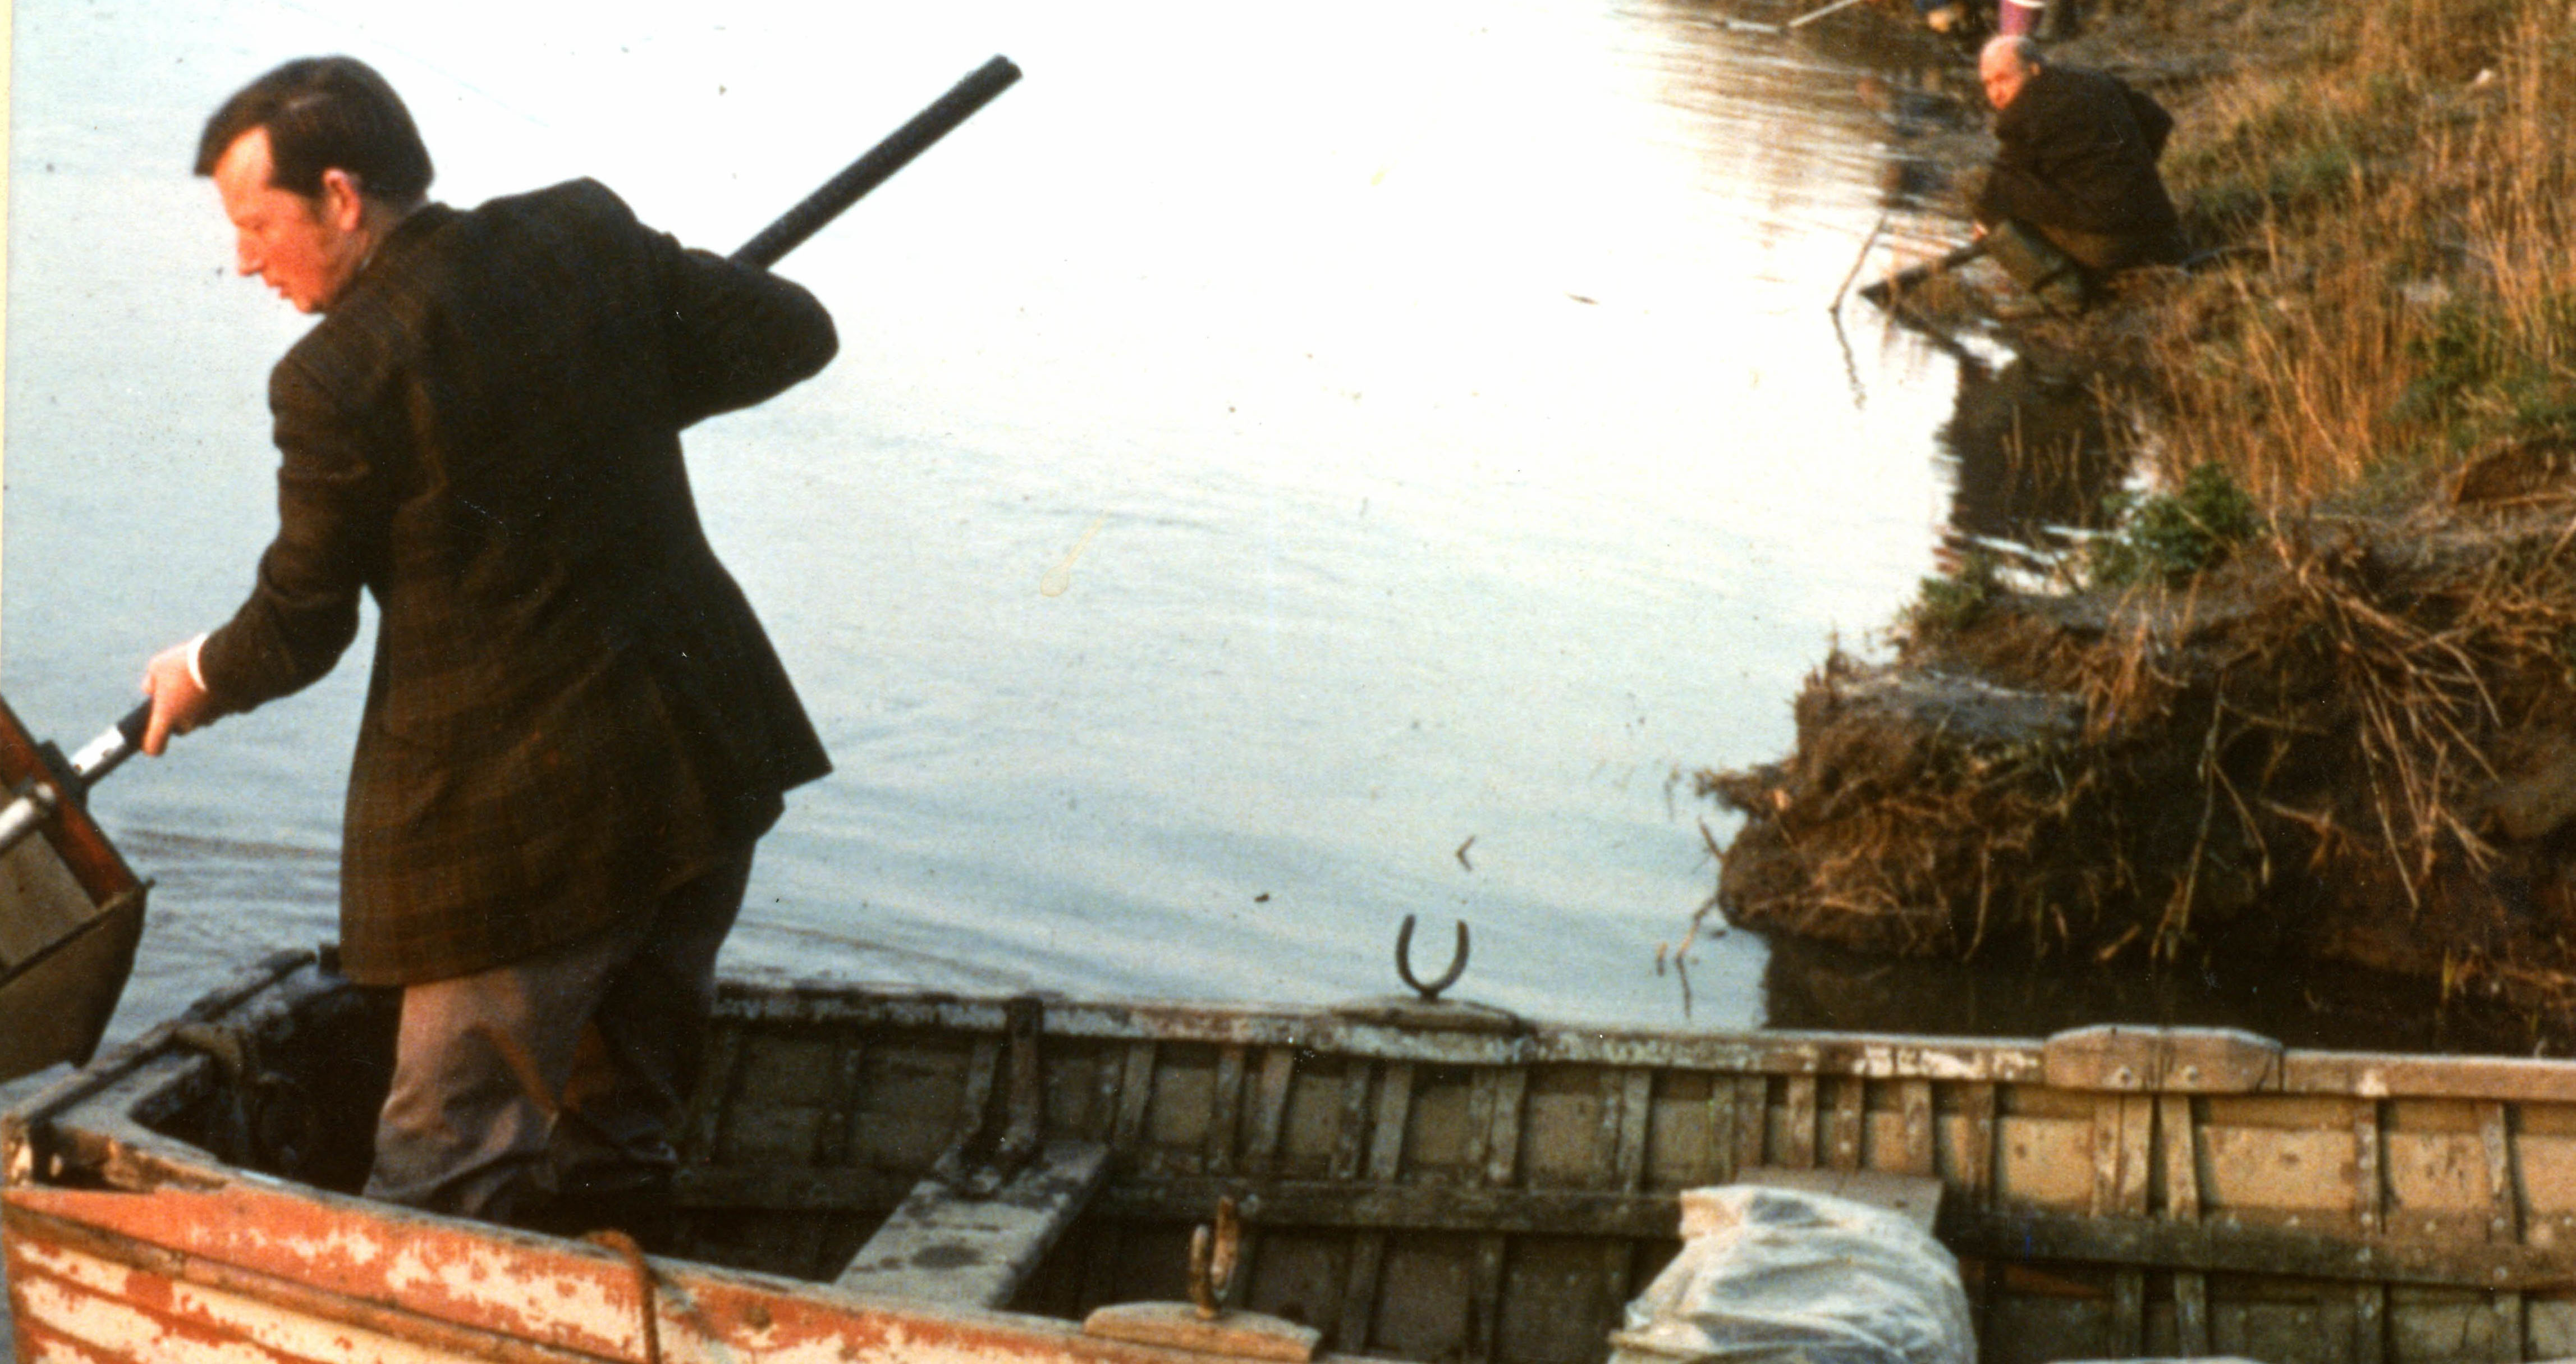 A fisherman catching eels